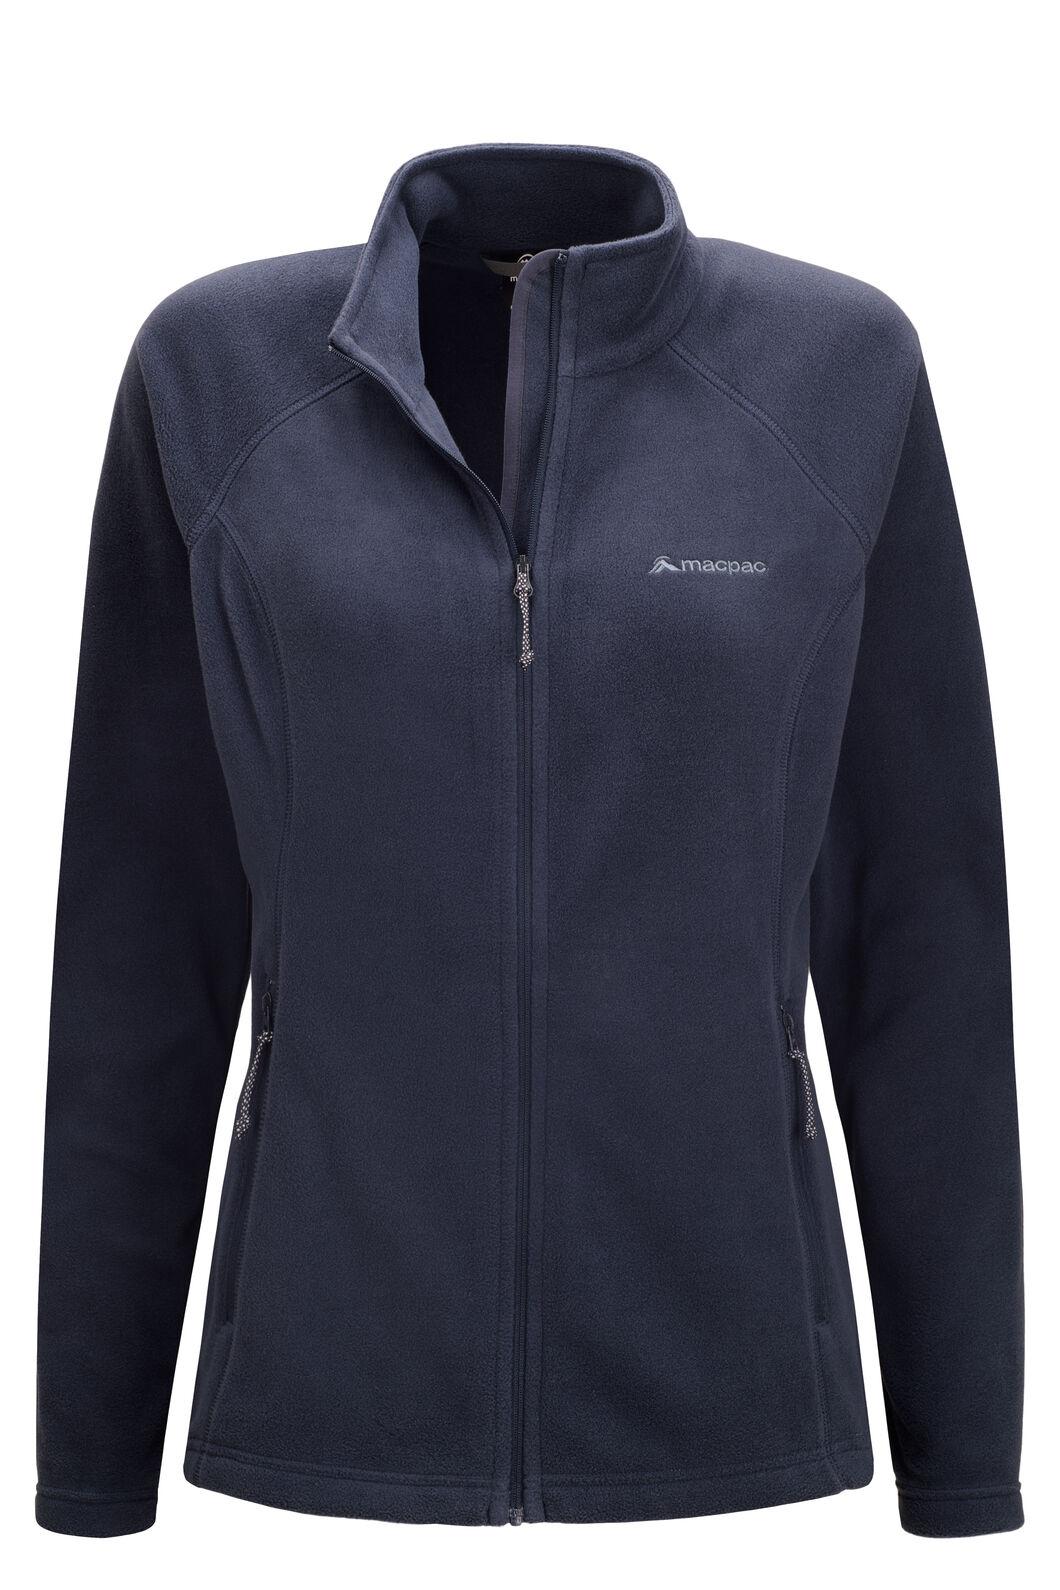 Macpac Tui Polartec® Micro Fleece® Jacket — Women's, Total Eclipse, hi-res